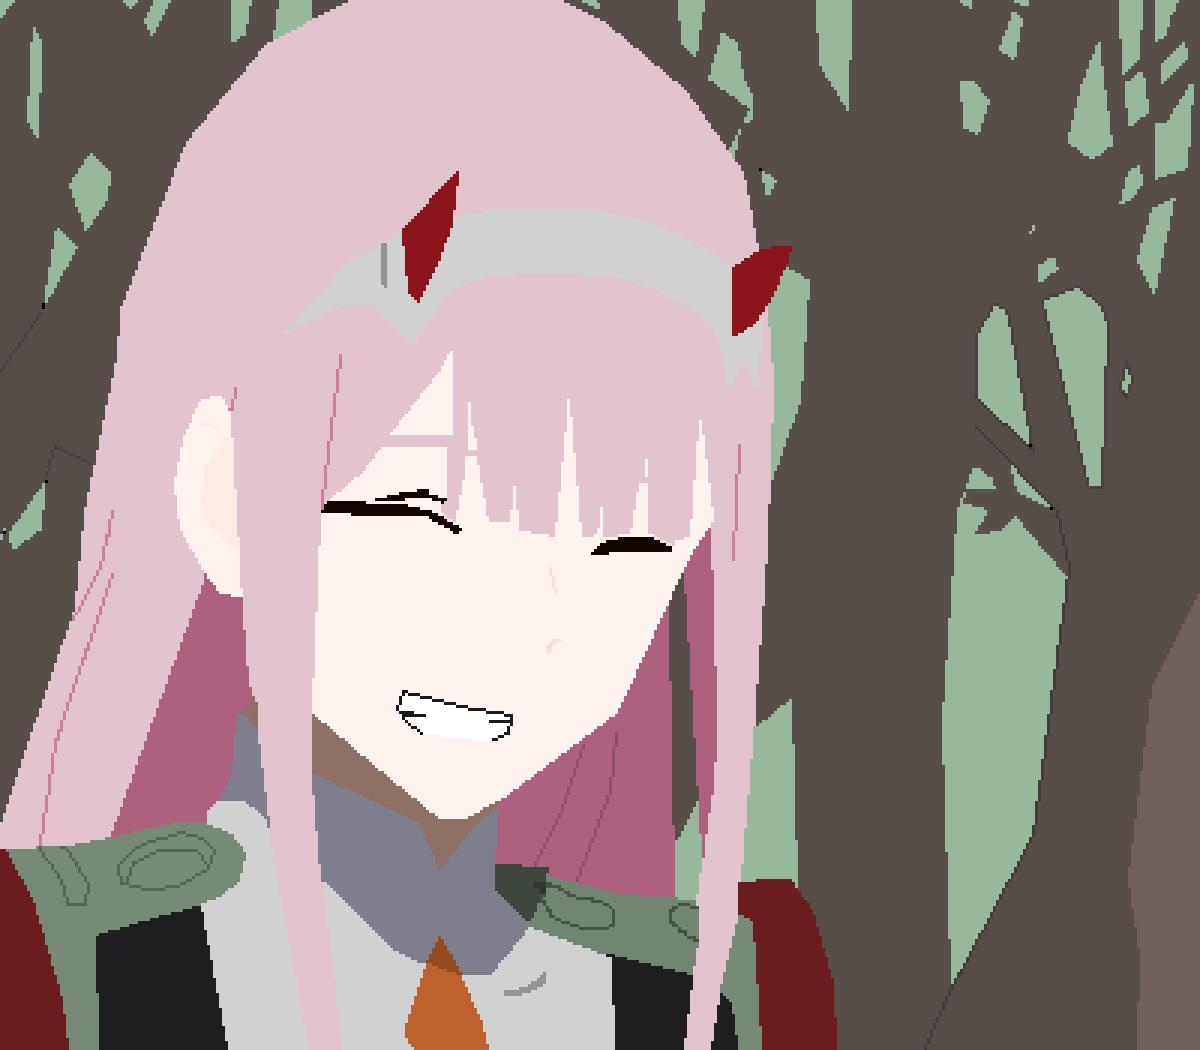 main-image-#anime IDK why I traced this ¯\_(ツ)_/¯  by AlicexArashi